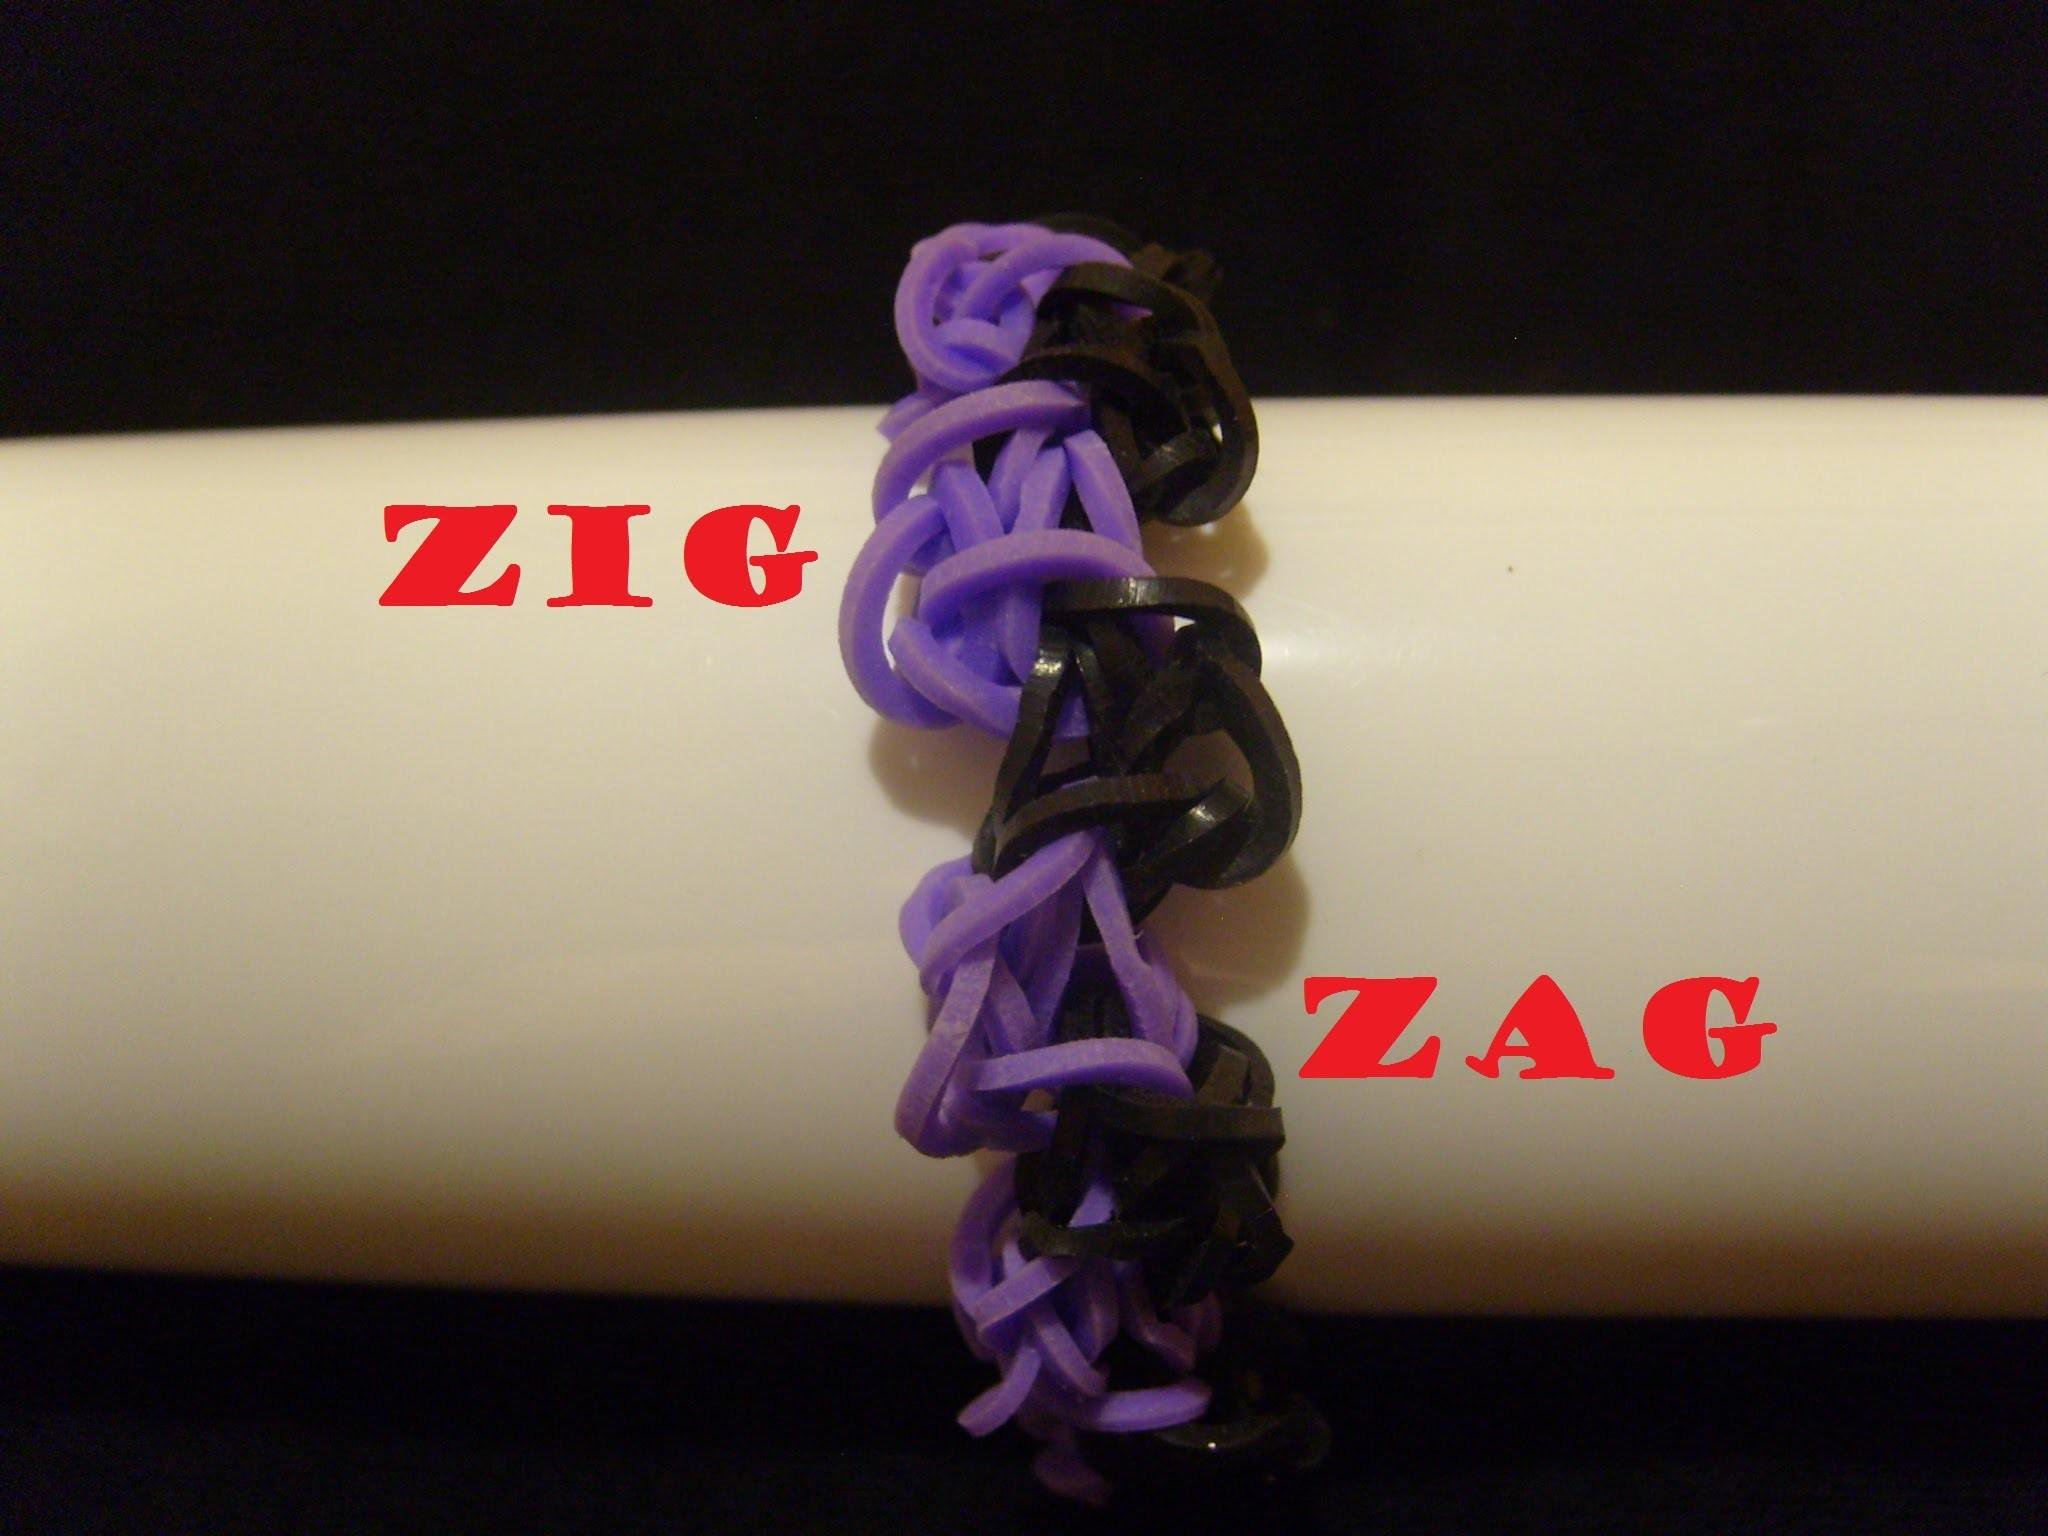 Bracelet elastique ZigZag, tuto francais facile, rainbow loom bands